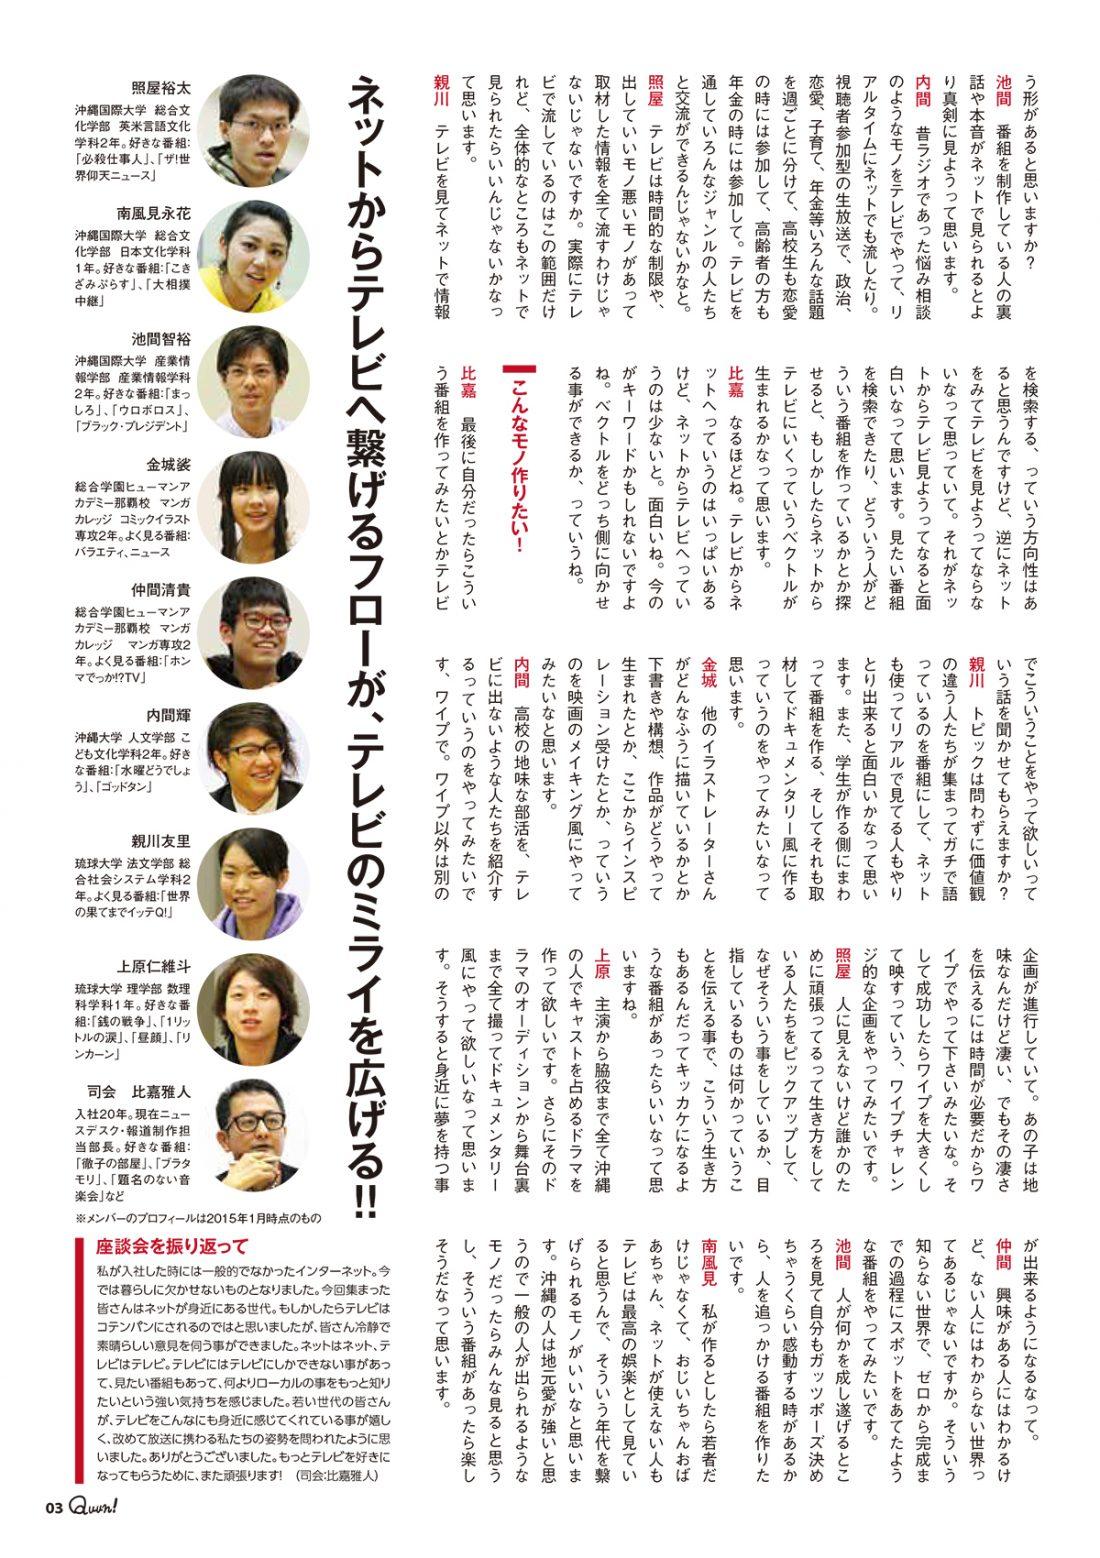 http://www.qab.co.jp/qgoro/wp-content/uploads/quun_0405-1100x1558.jpg